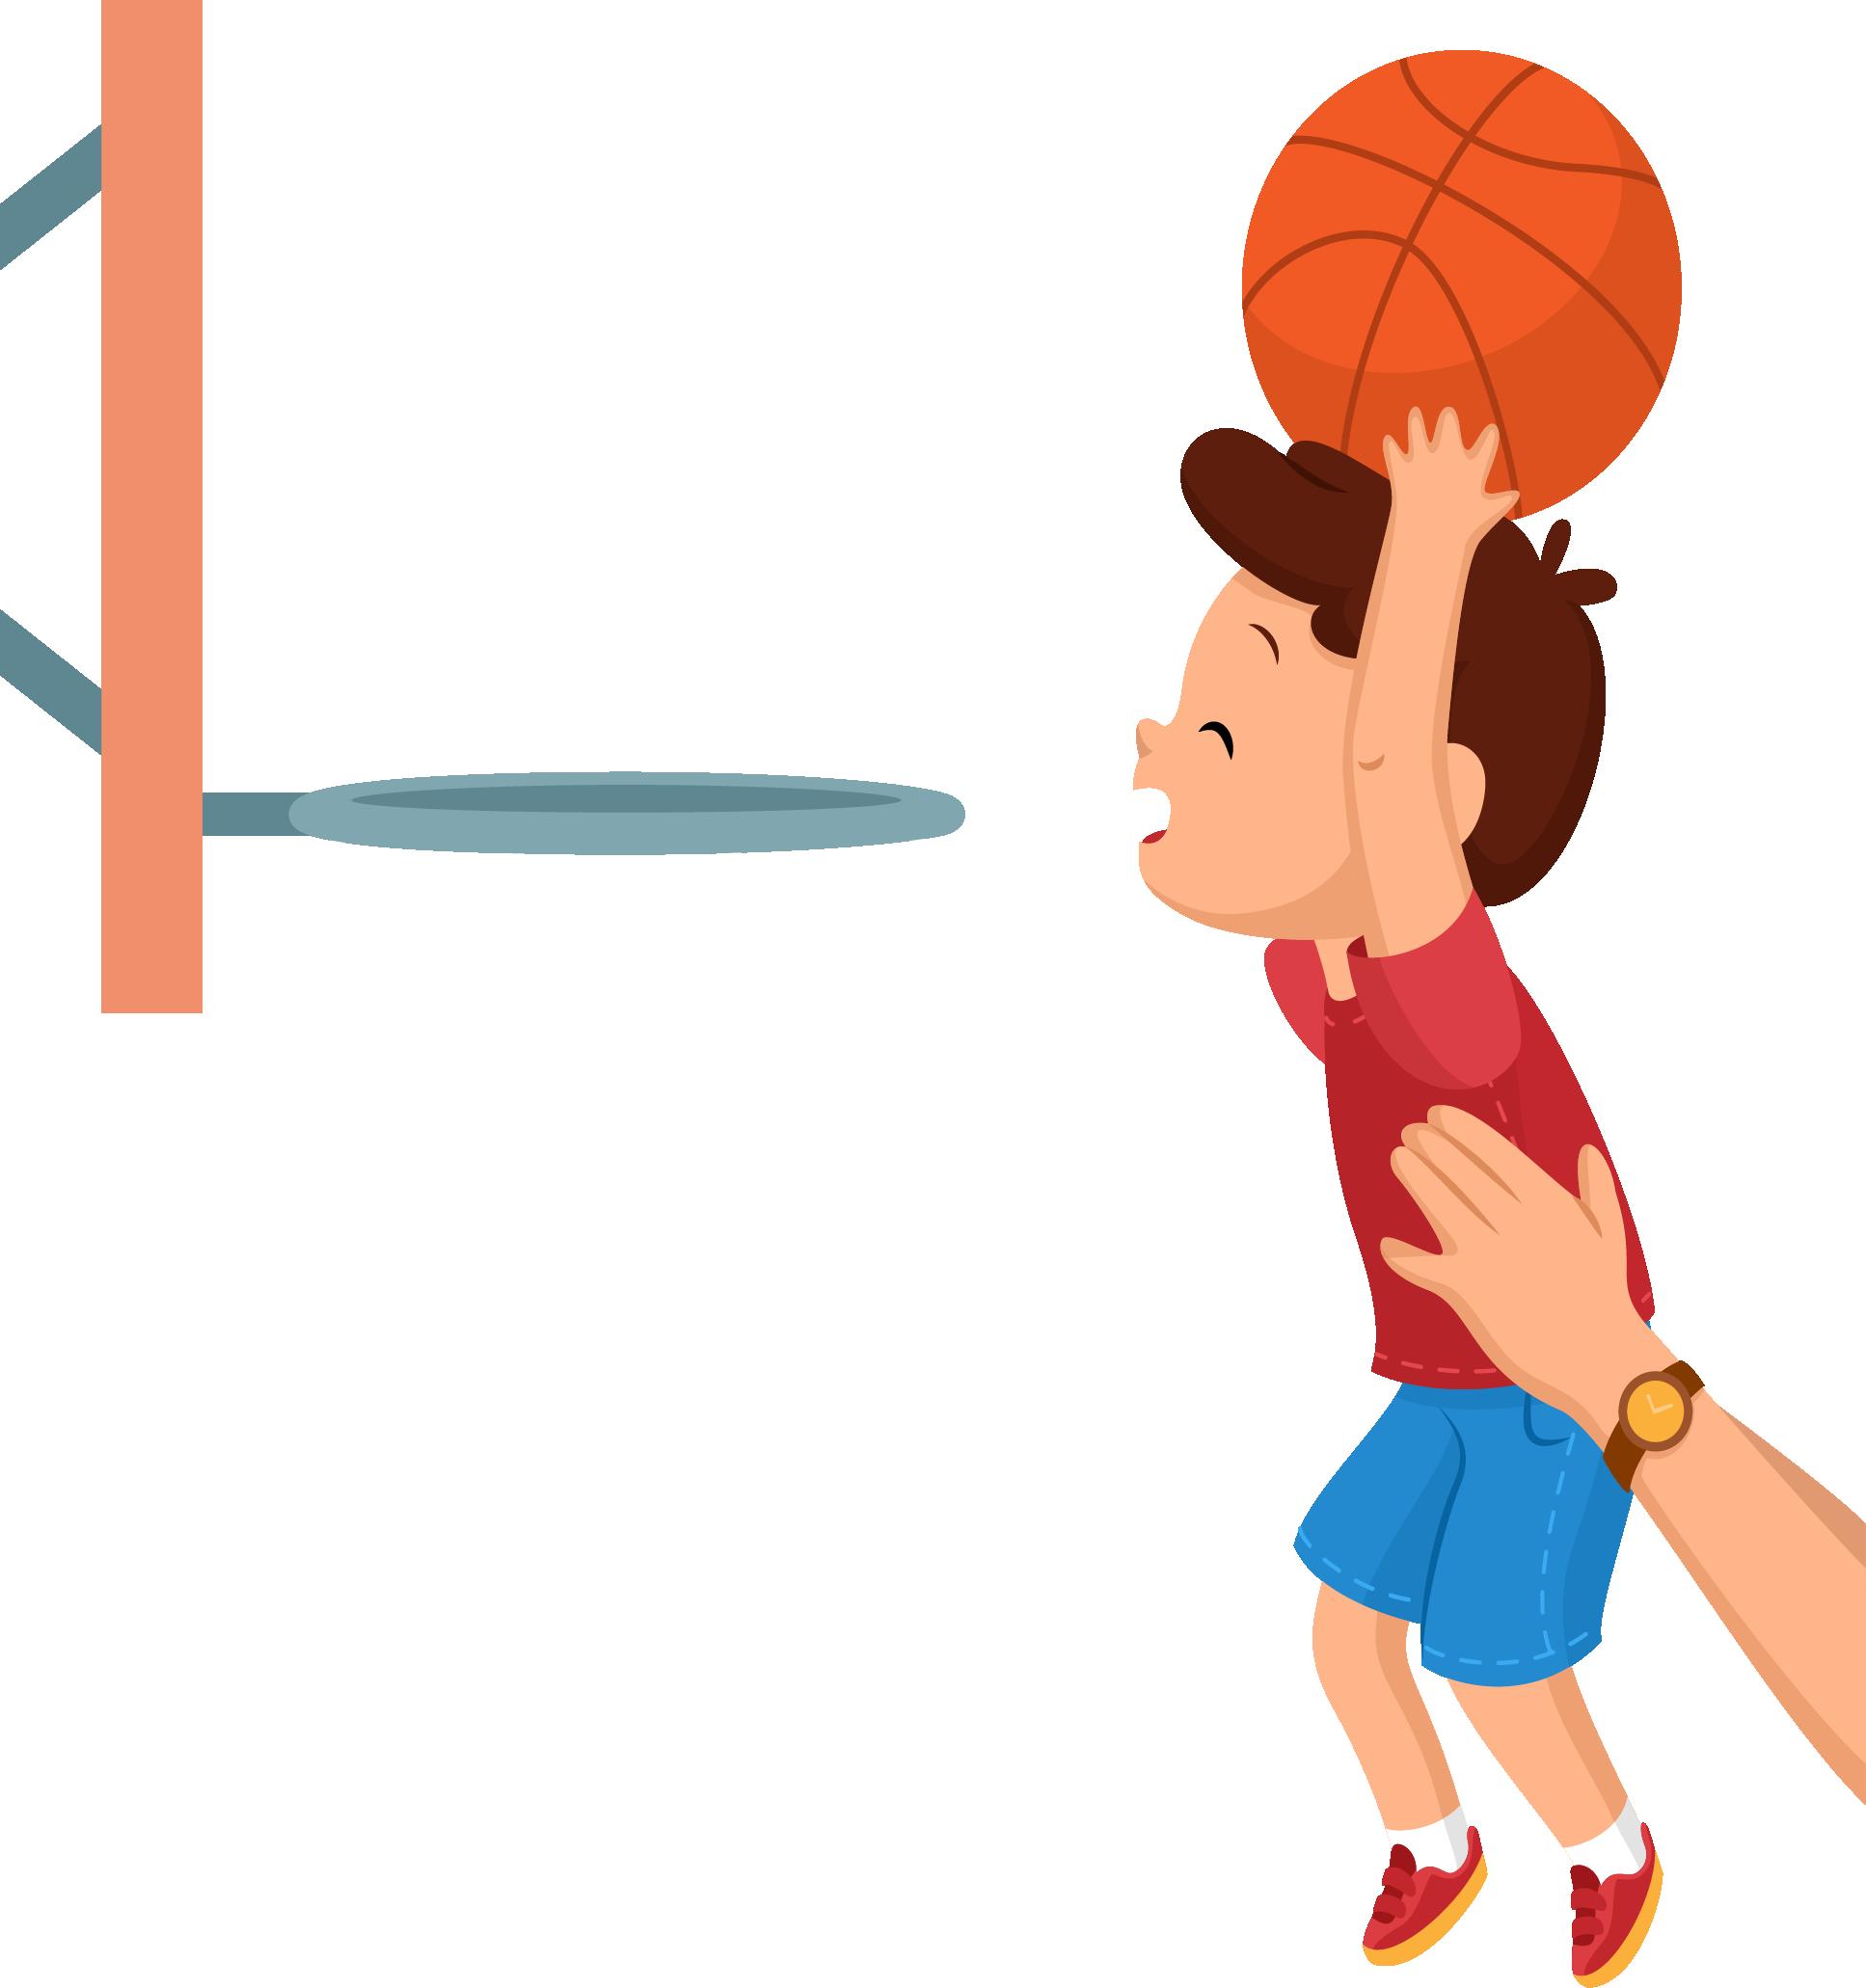 Backboard clip art start. Clipart boy basketball player